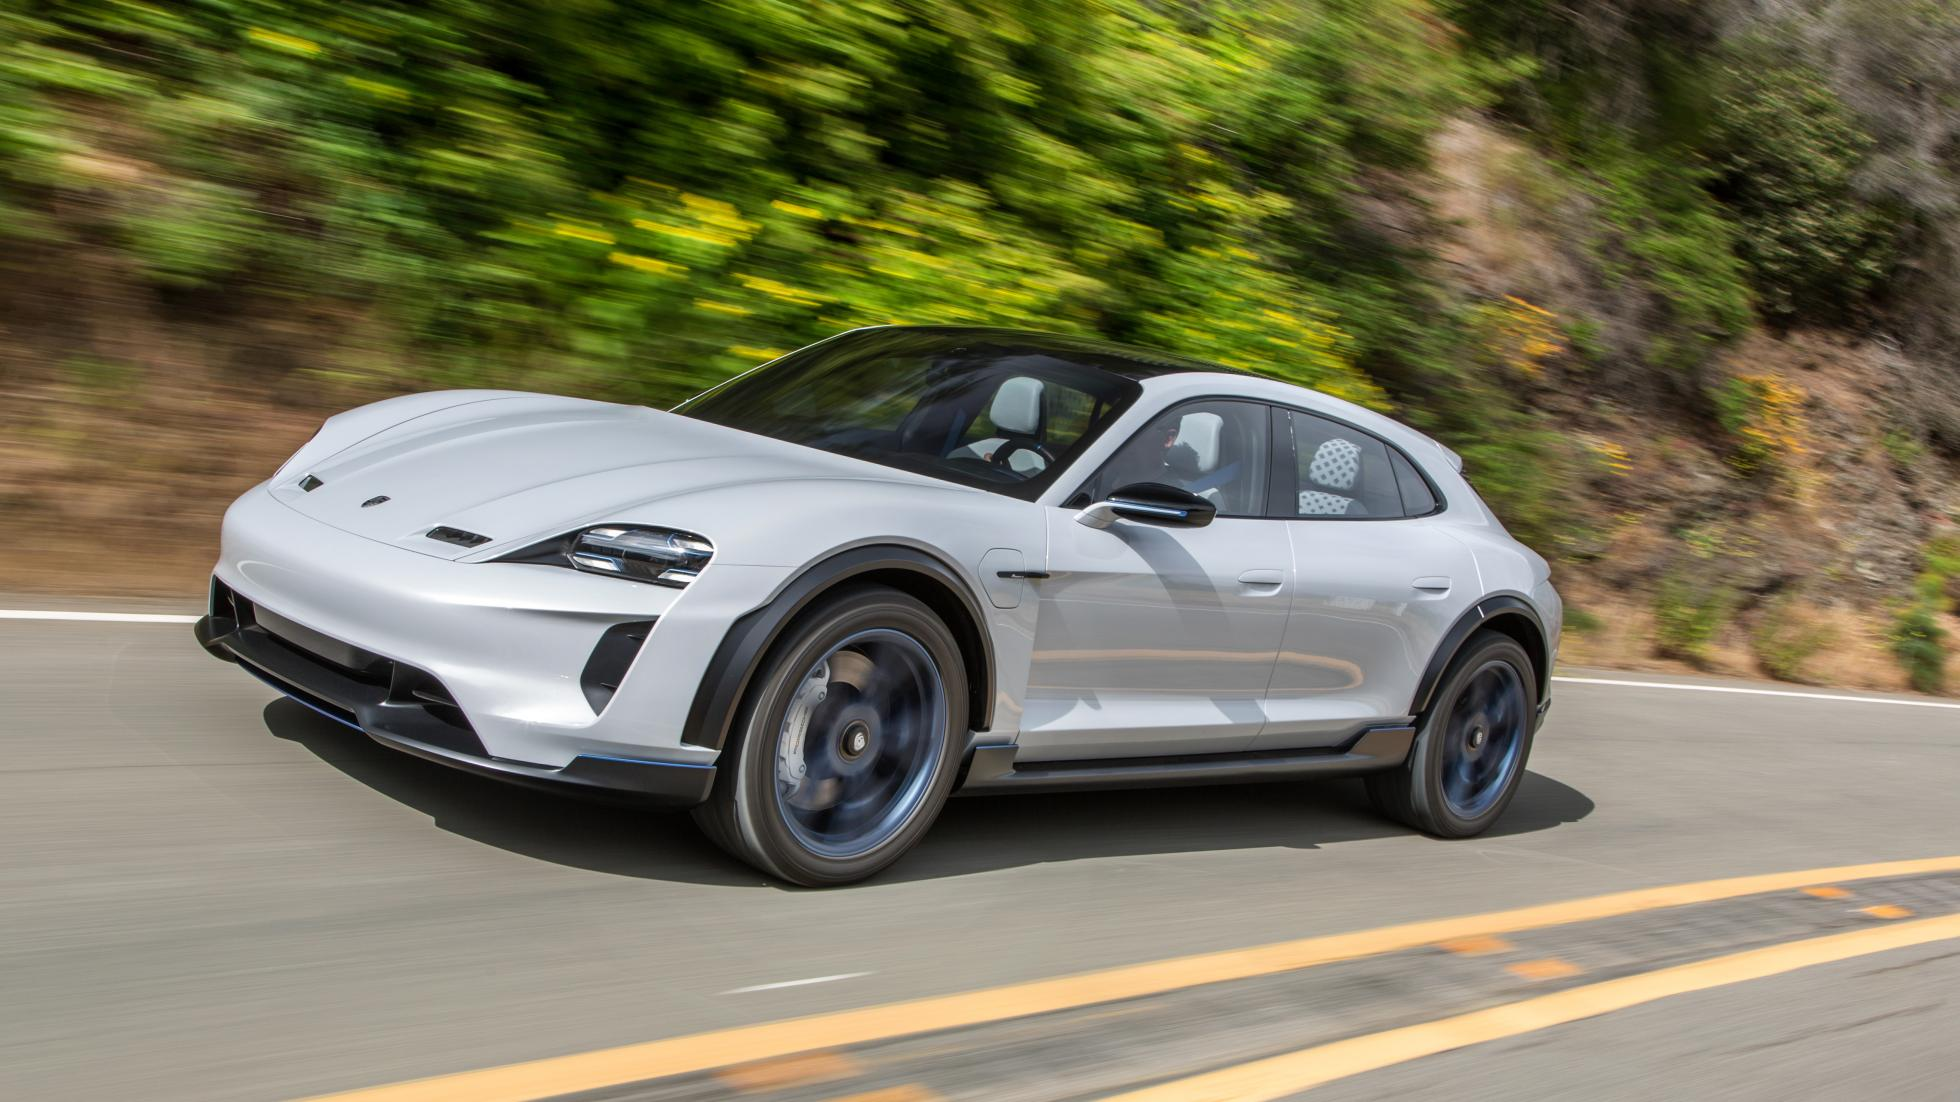 Le Porsche Taycan Cross Turismo arrivera en 2020 - Galerie